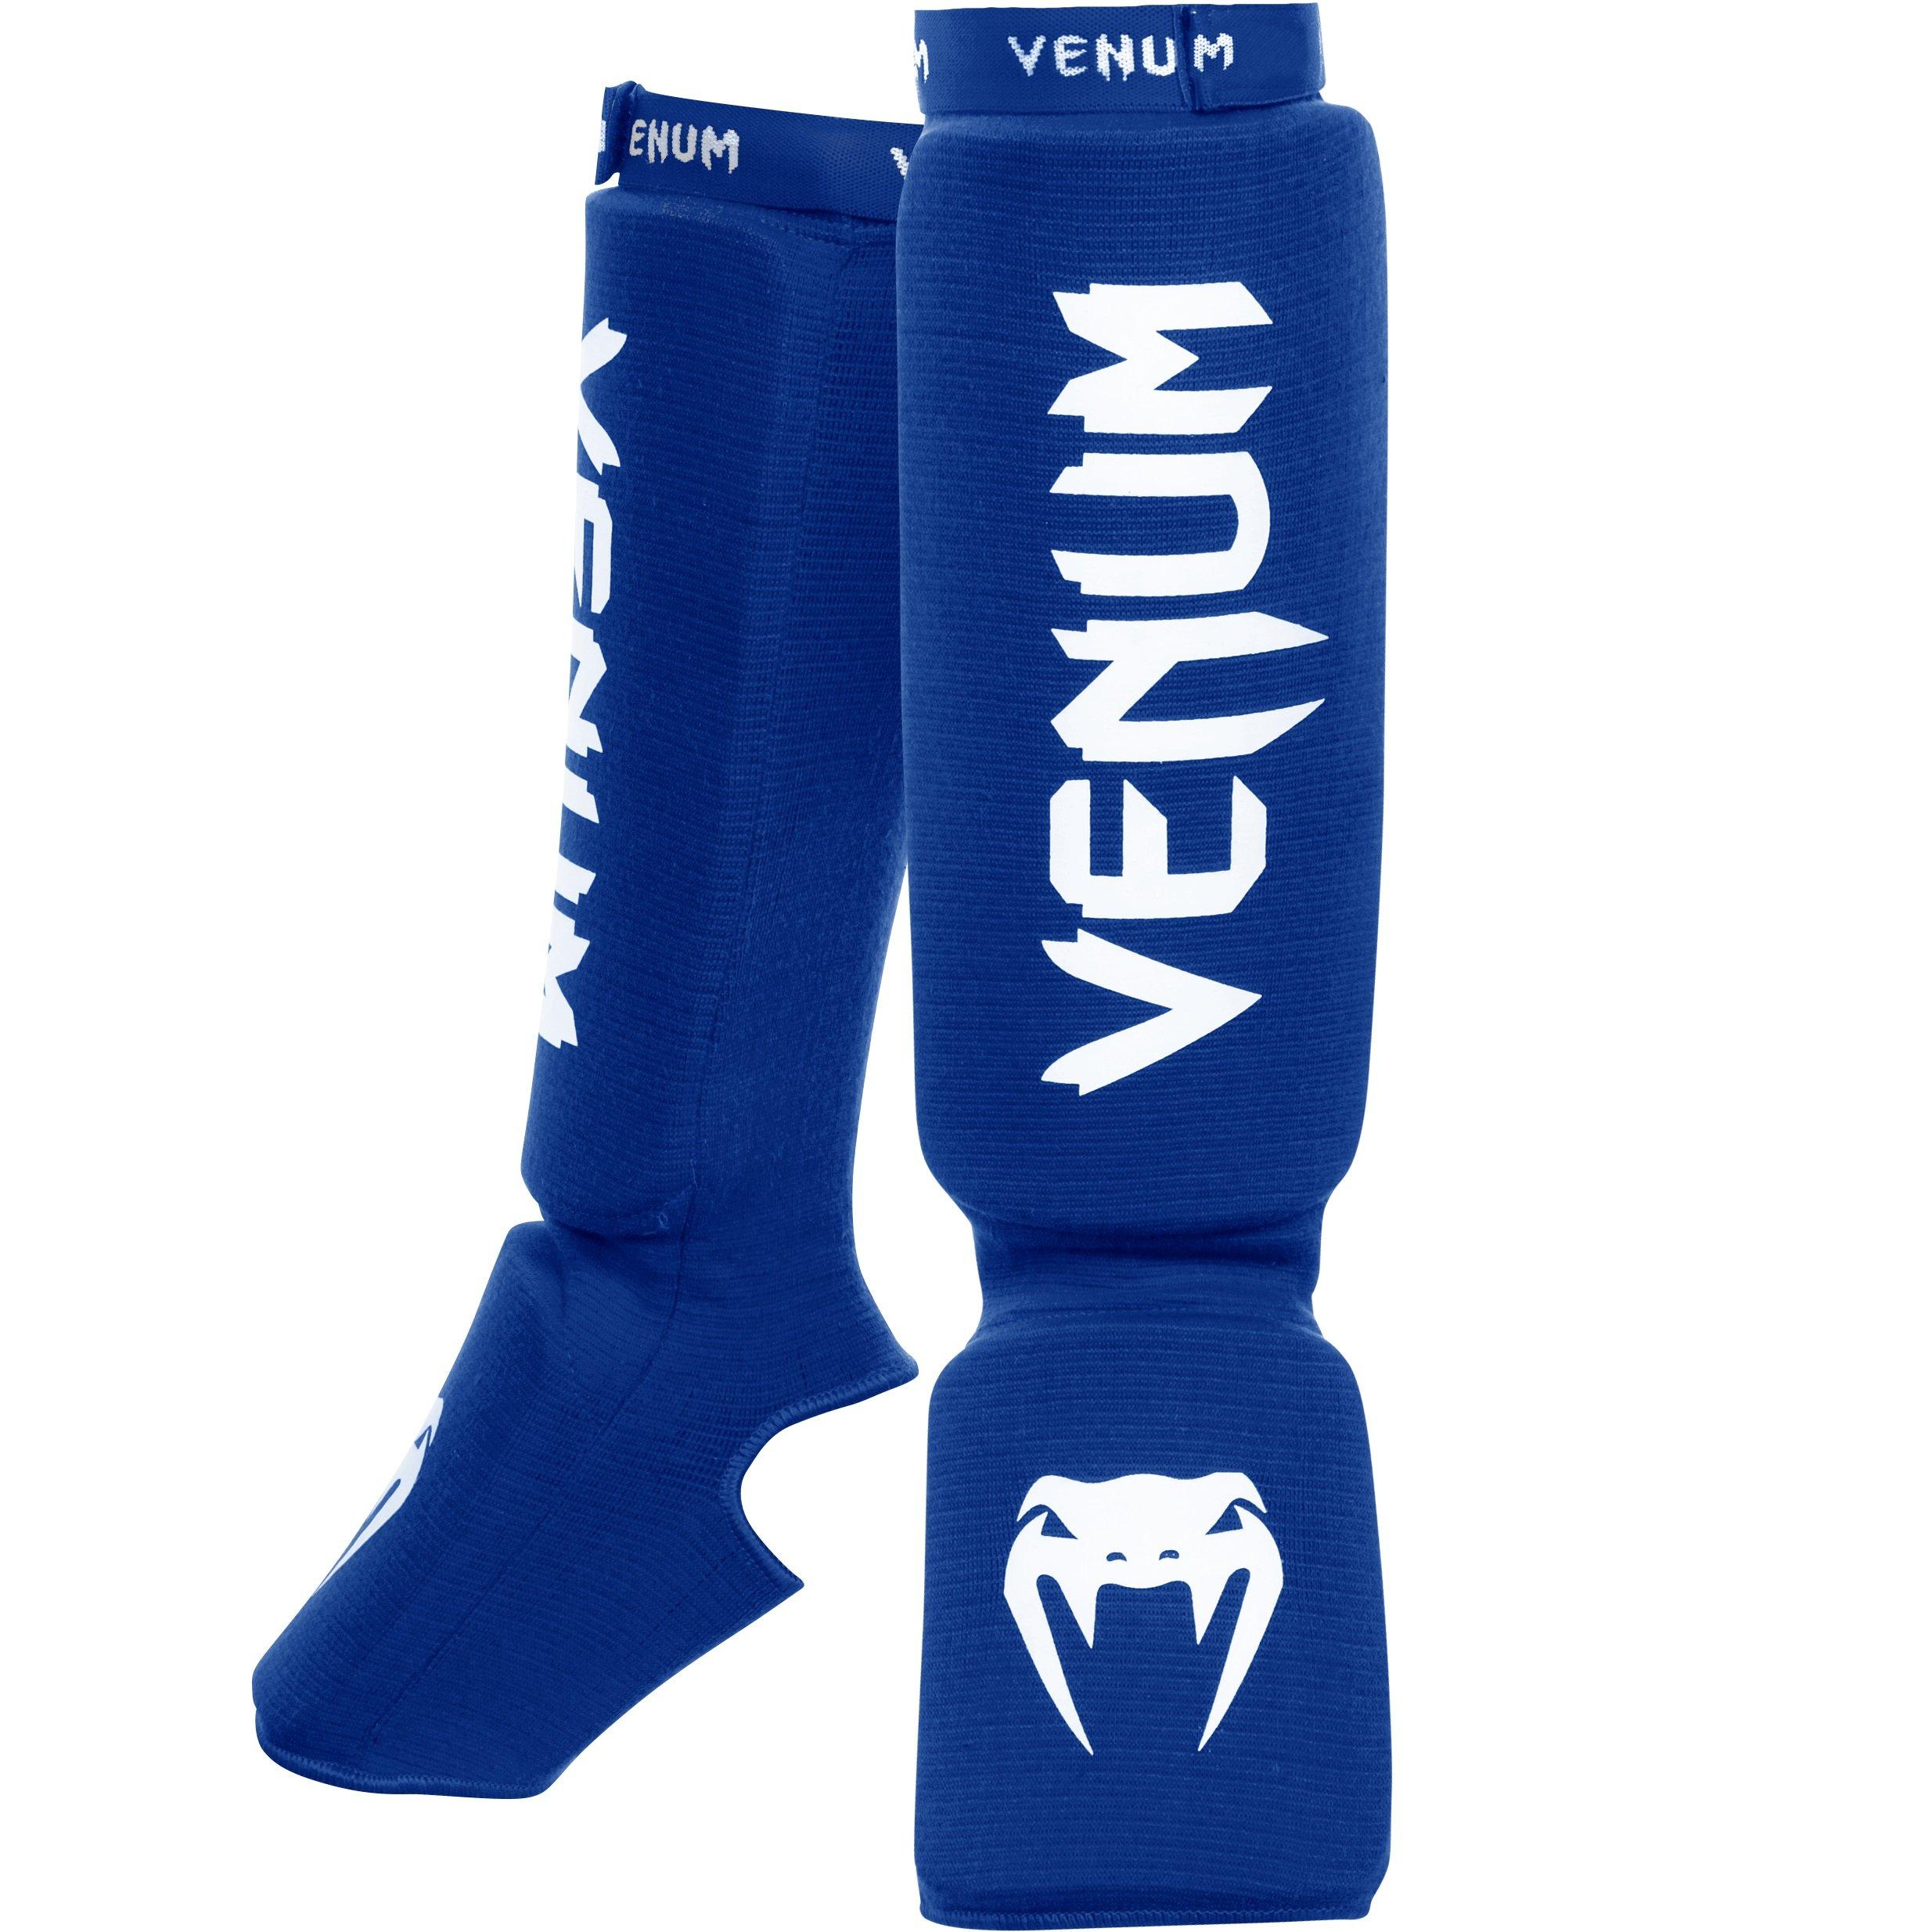 Venum ''Kontact'' Shin and Instep Guards, Blue